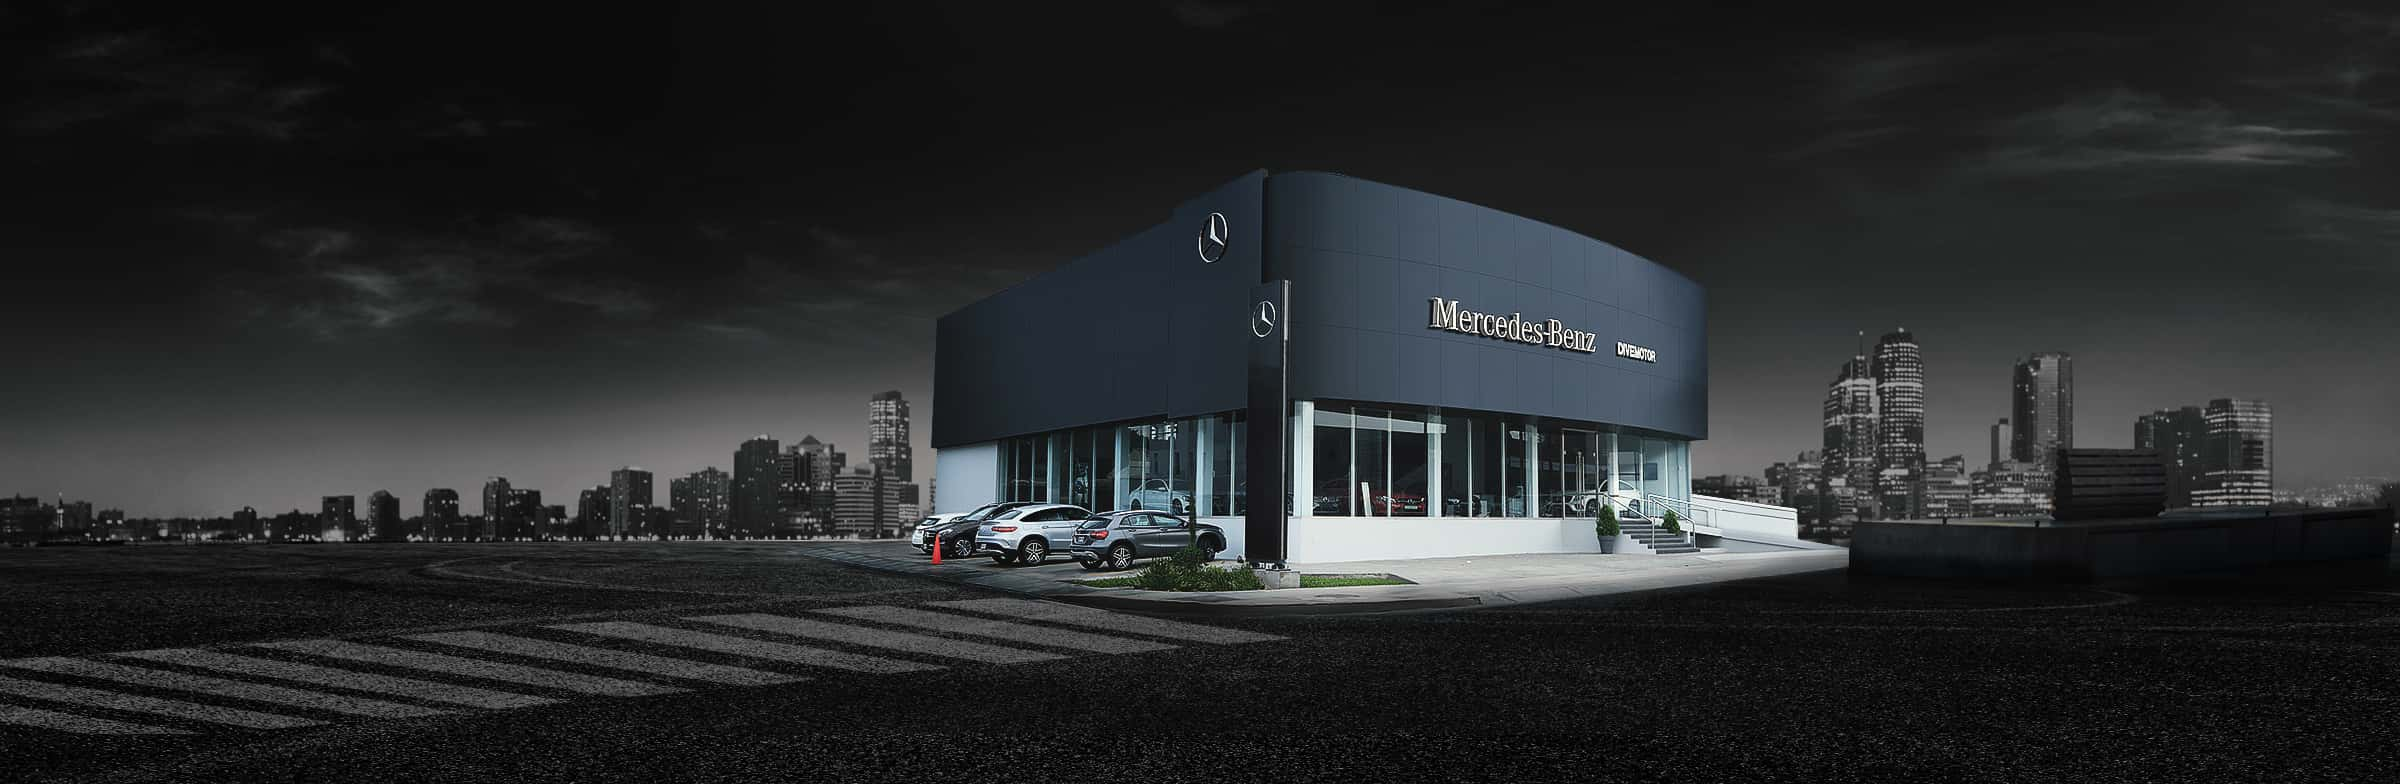 ¡Nos mudamos! Nuevo taller Mercedes-Benz